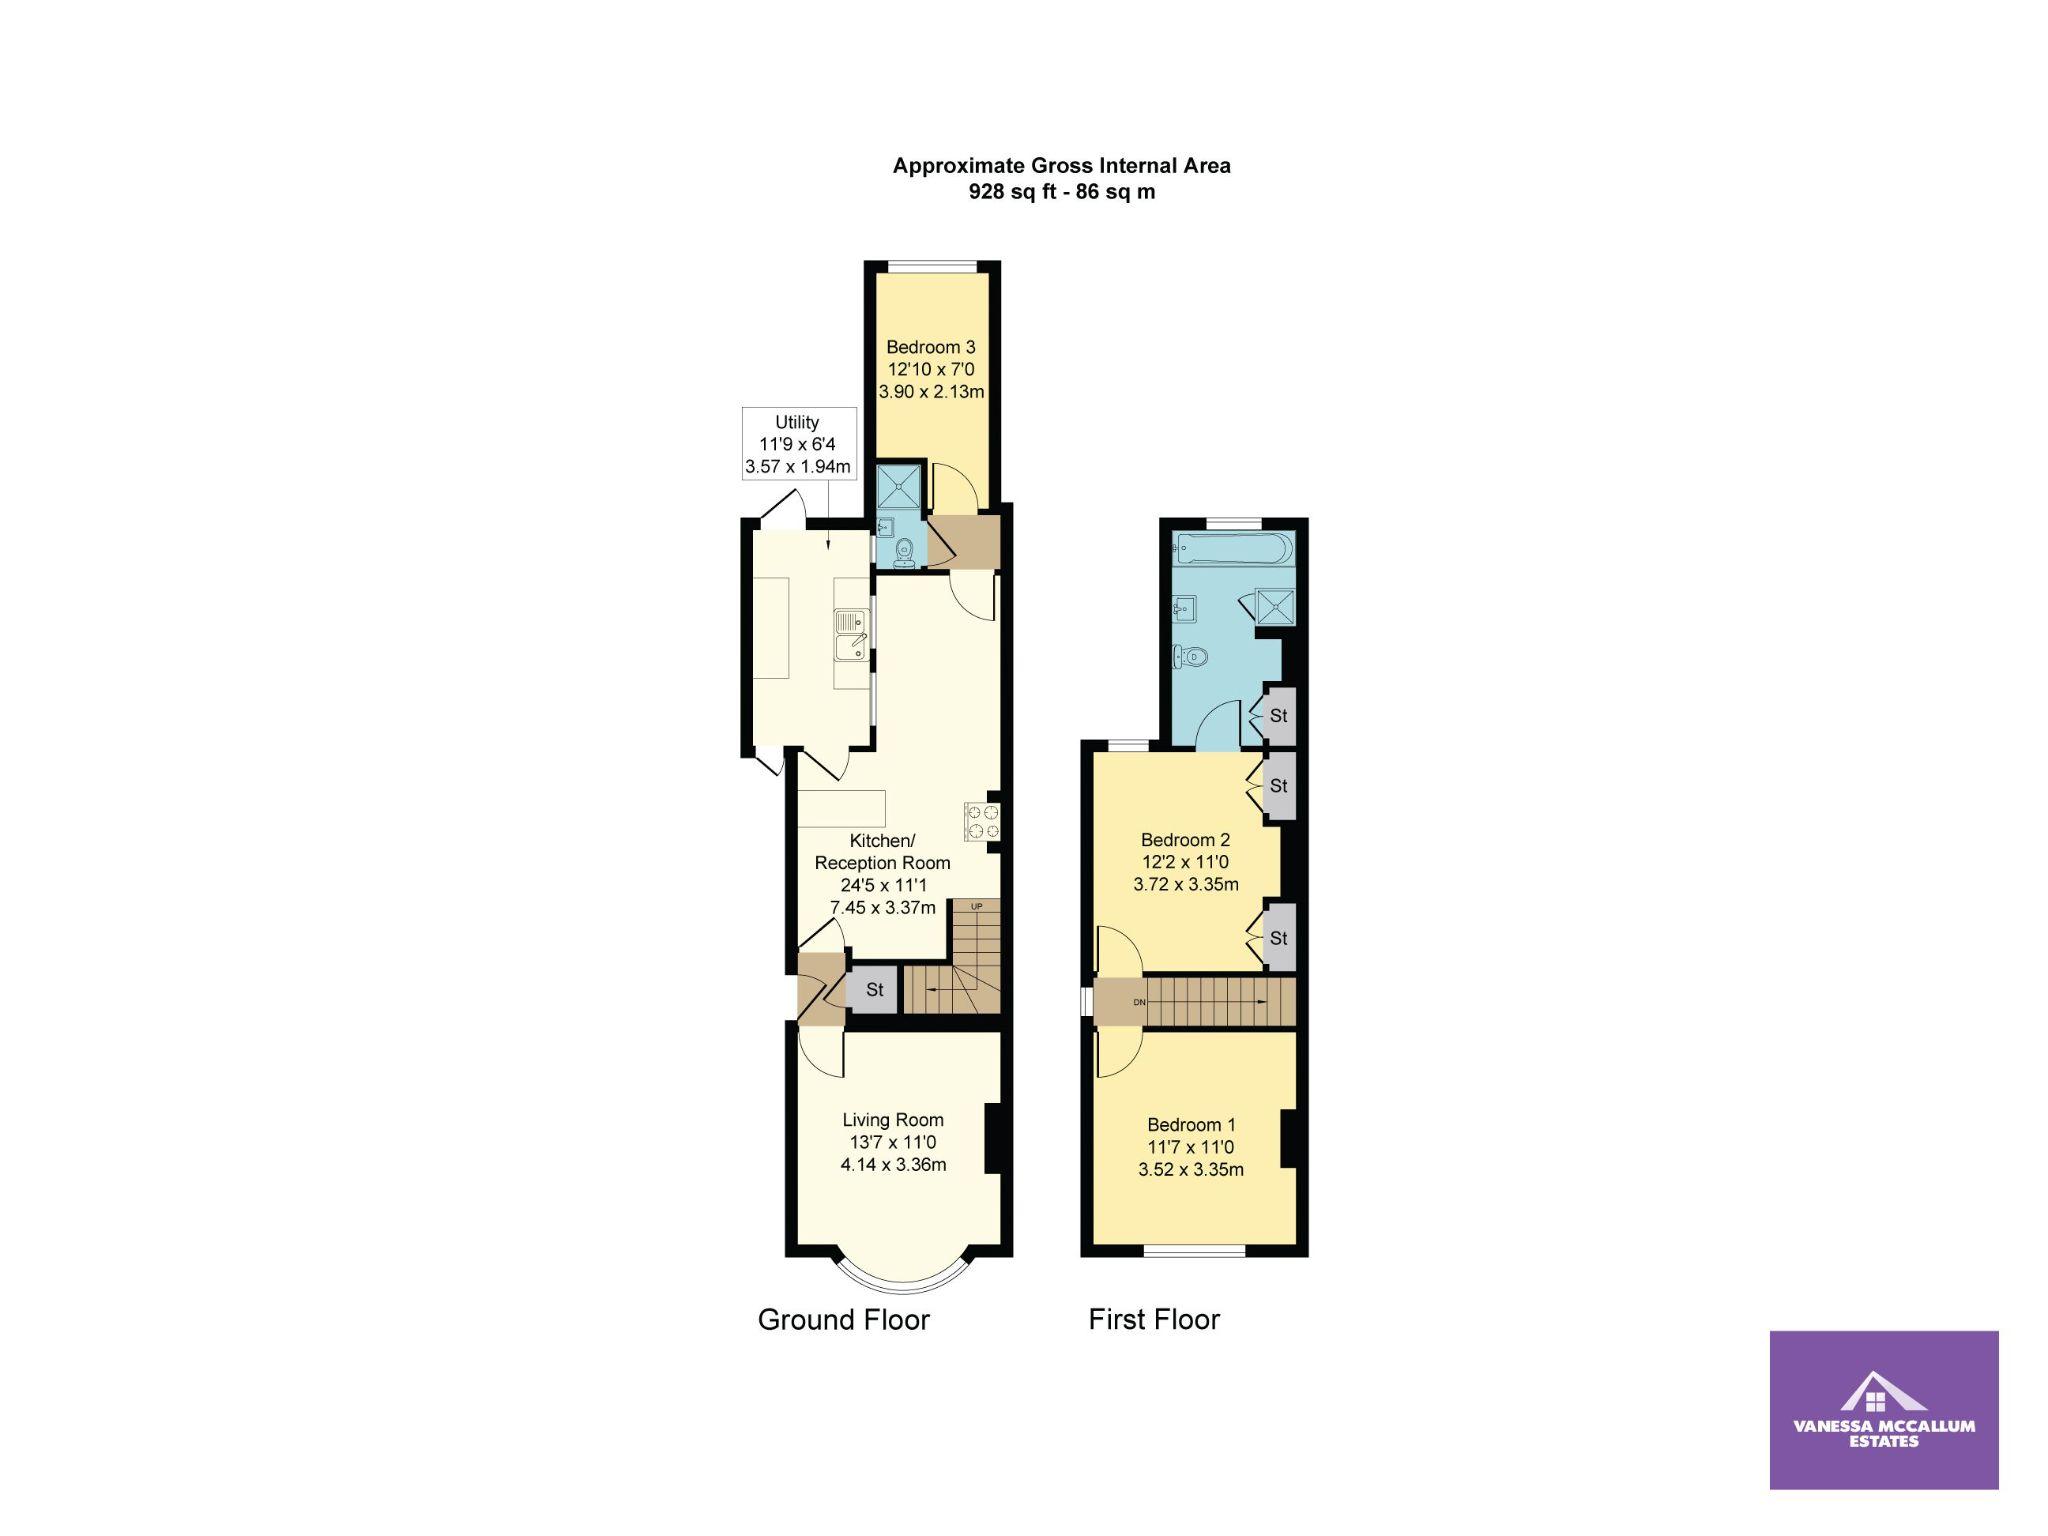 3 bedroom cottage house SSTC in Little Heath Potters Bar - Floorplan 1